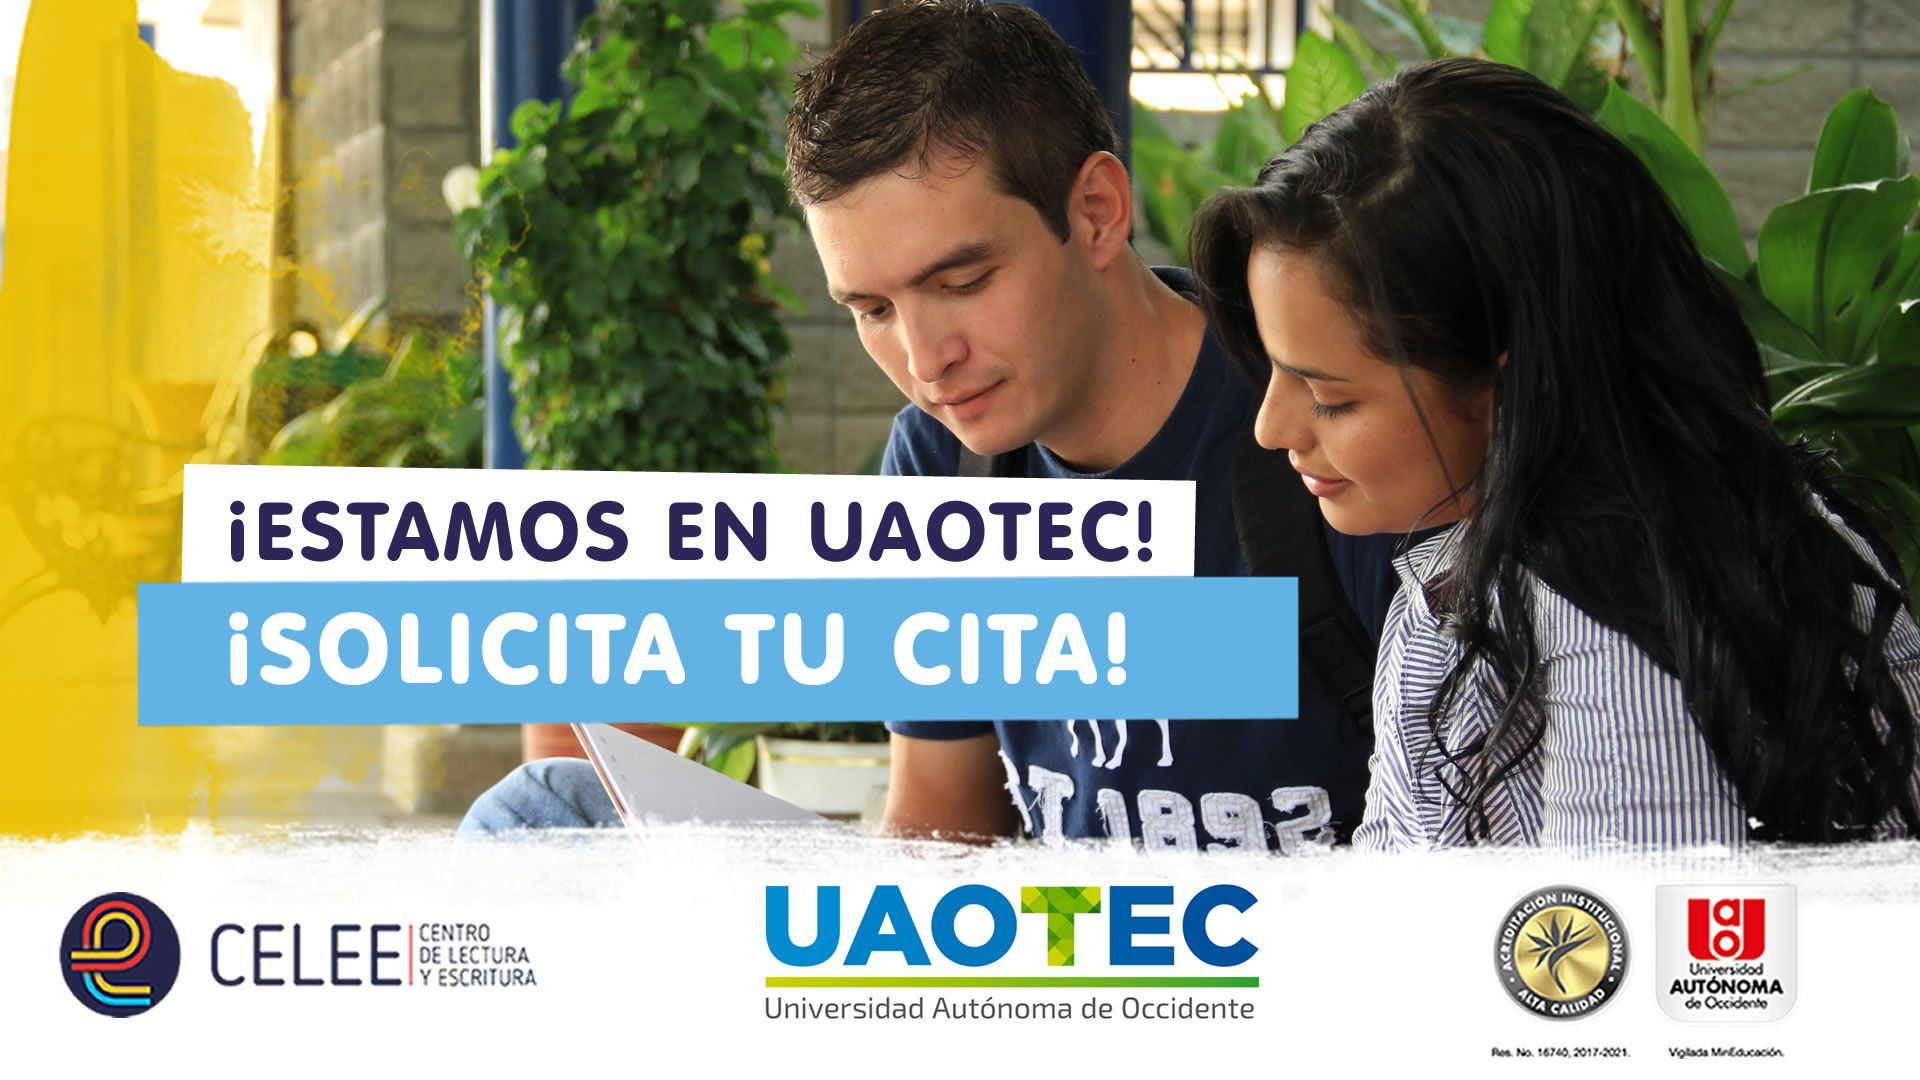 celee uaotec_export web